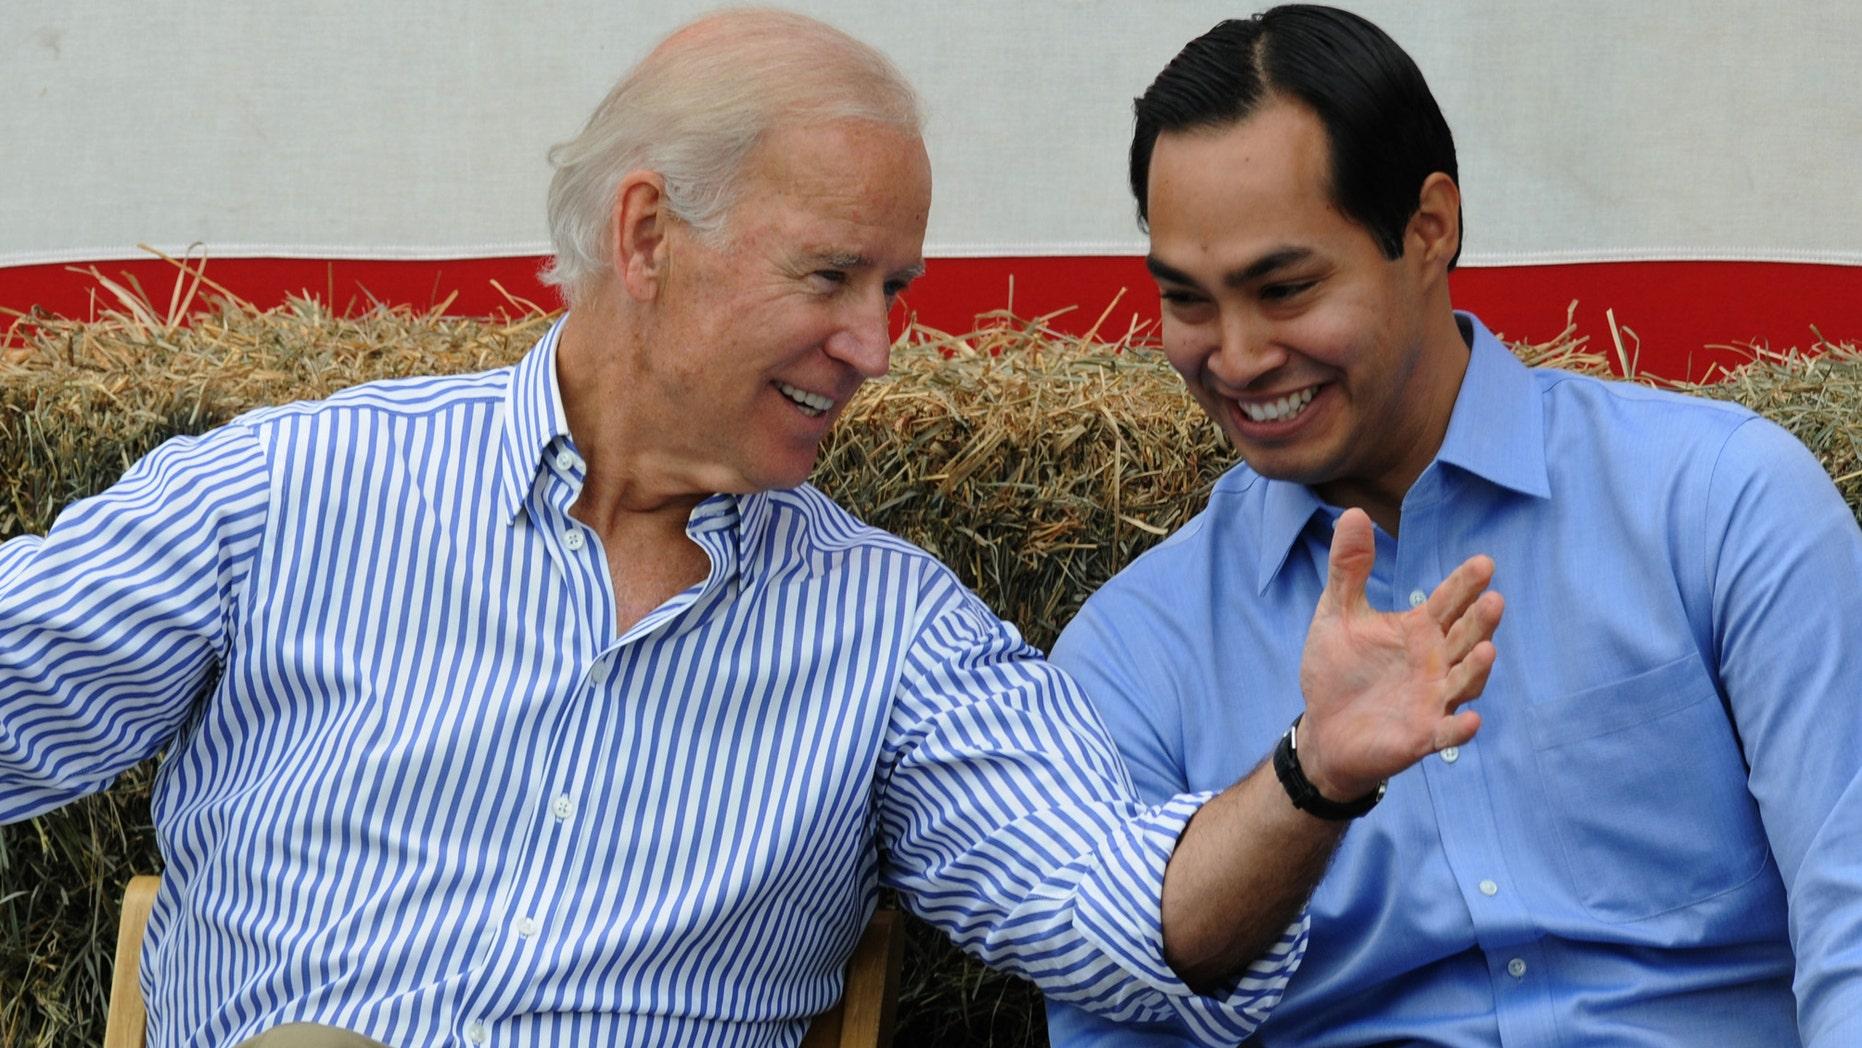 U.S. Vice President Joe Biden and San Antonio Mayor Julian Castro share a moment onstage at the 36th Annual Harkin Steak Fry on September 15, 2013 in Indianola, Iowa.